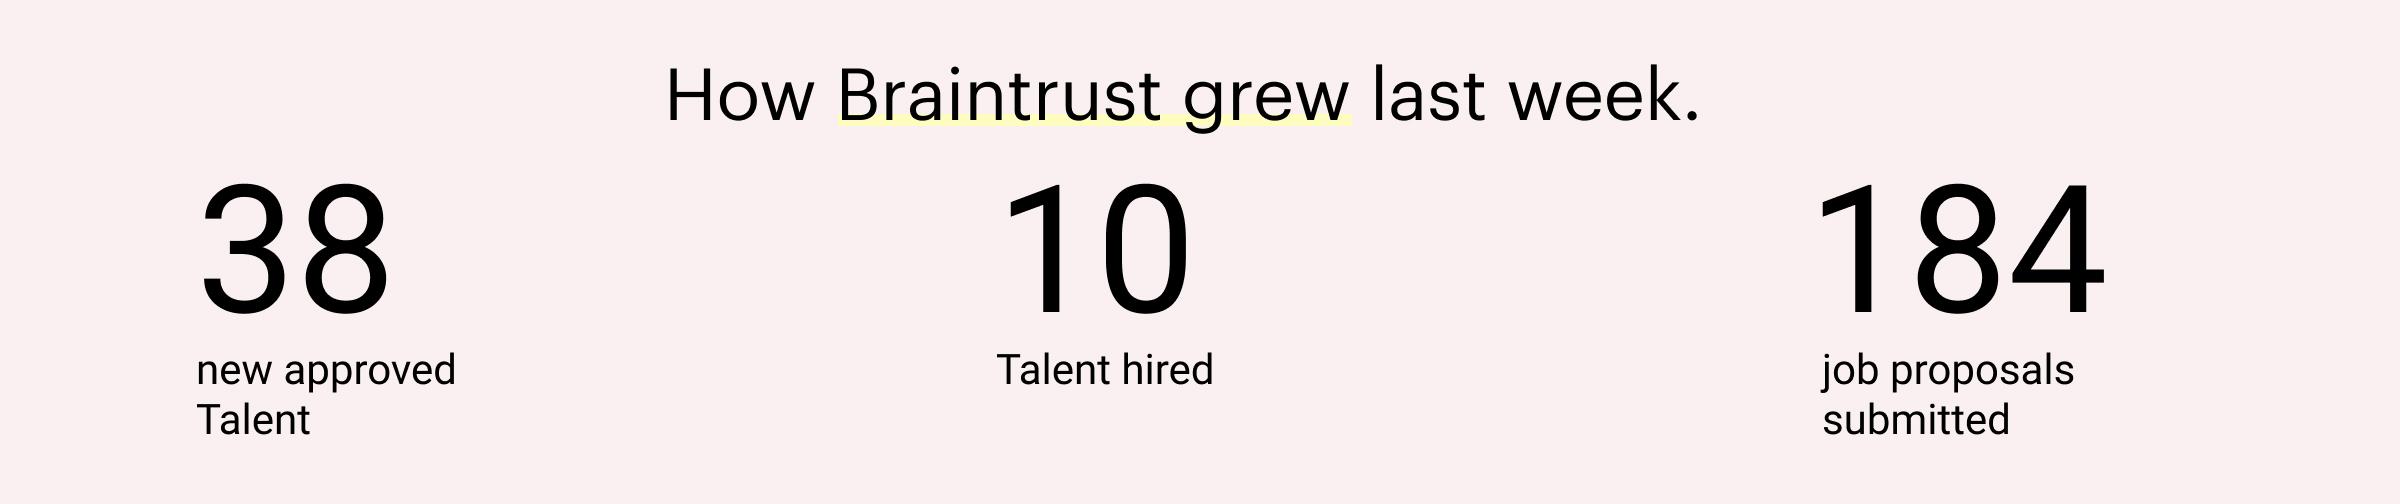 May 27 2021 All Hands How Braintrust Grew